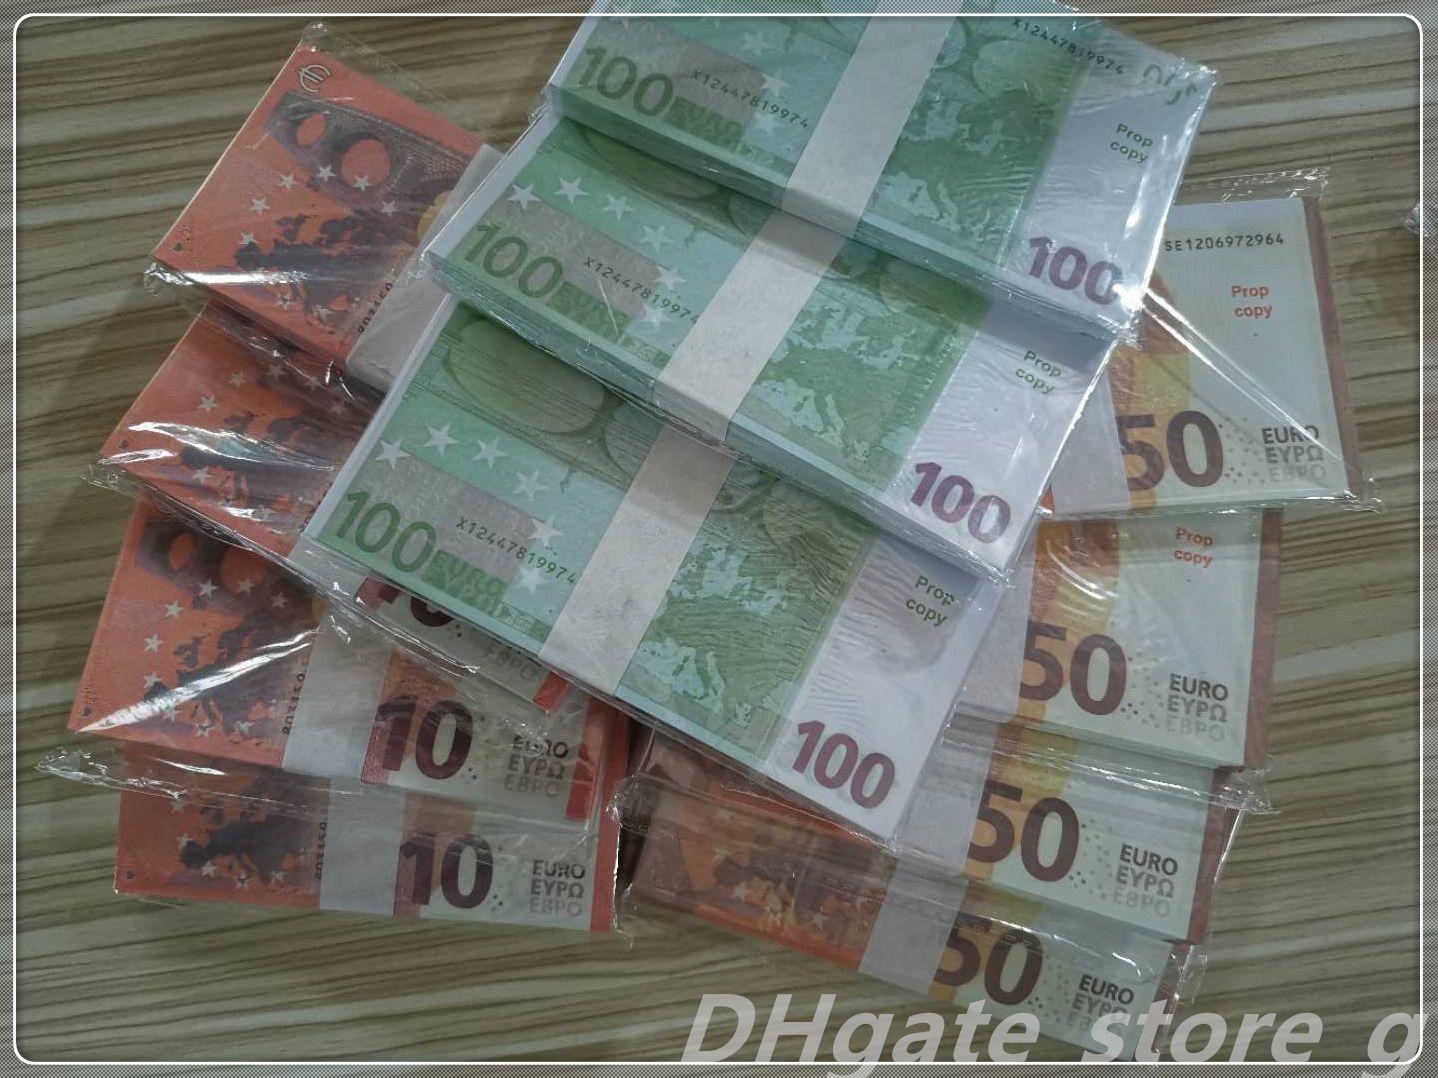 Money Quality Play Bar Billet Movie Discothèques Money Faux PROPL LB-101 FAIS POID EUR EURO MONEY ATMOSPHERE TOP BILLET BILLETTK PUMTK XADNN